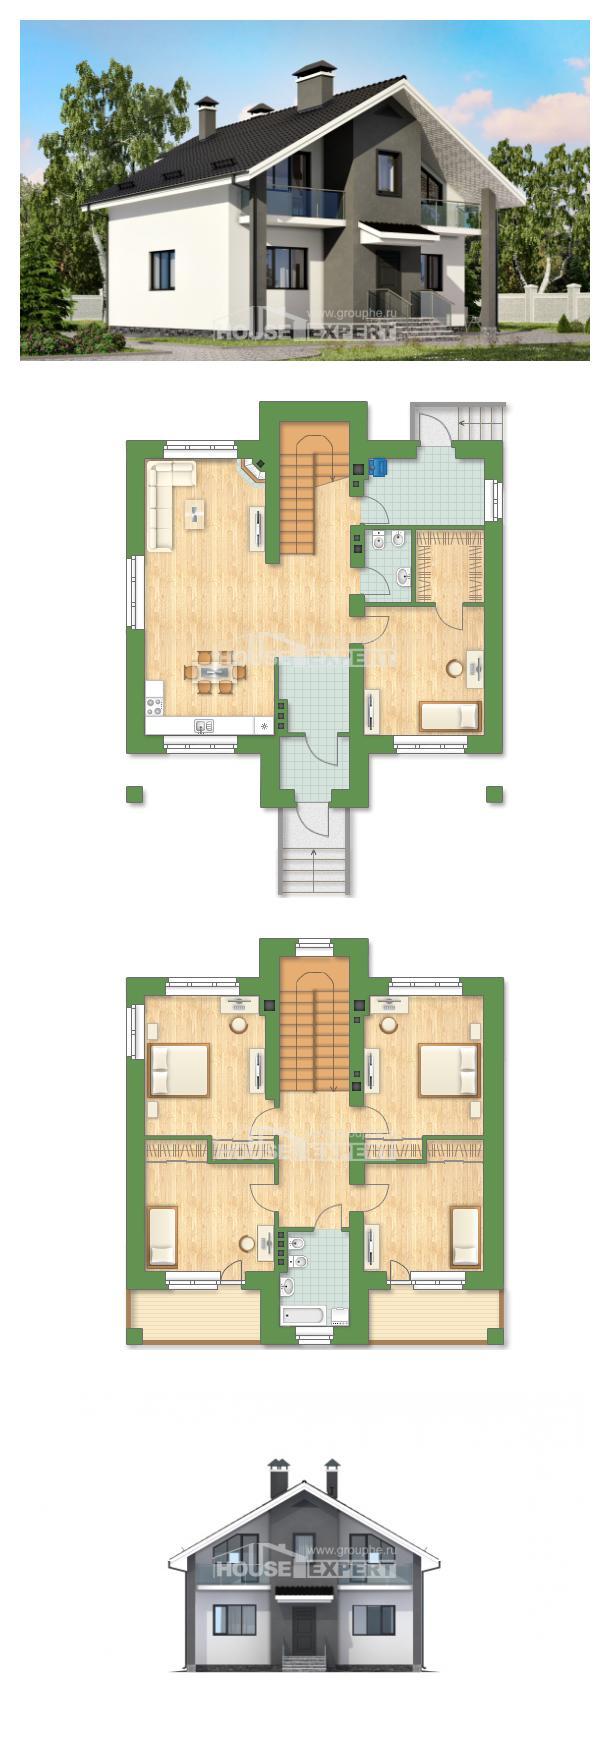 Проект дома 150-005-Л | House Expert